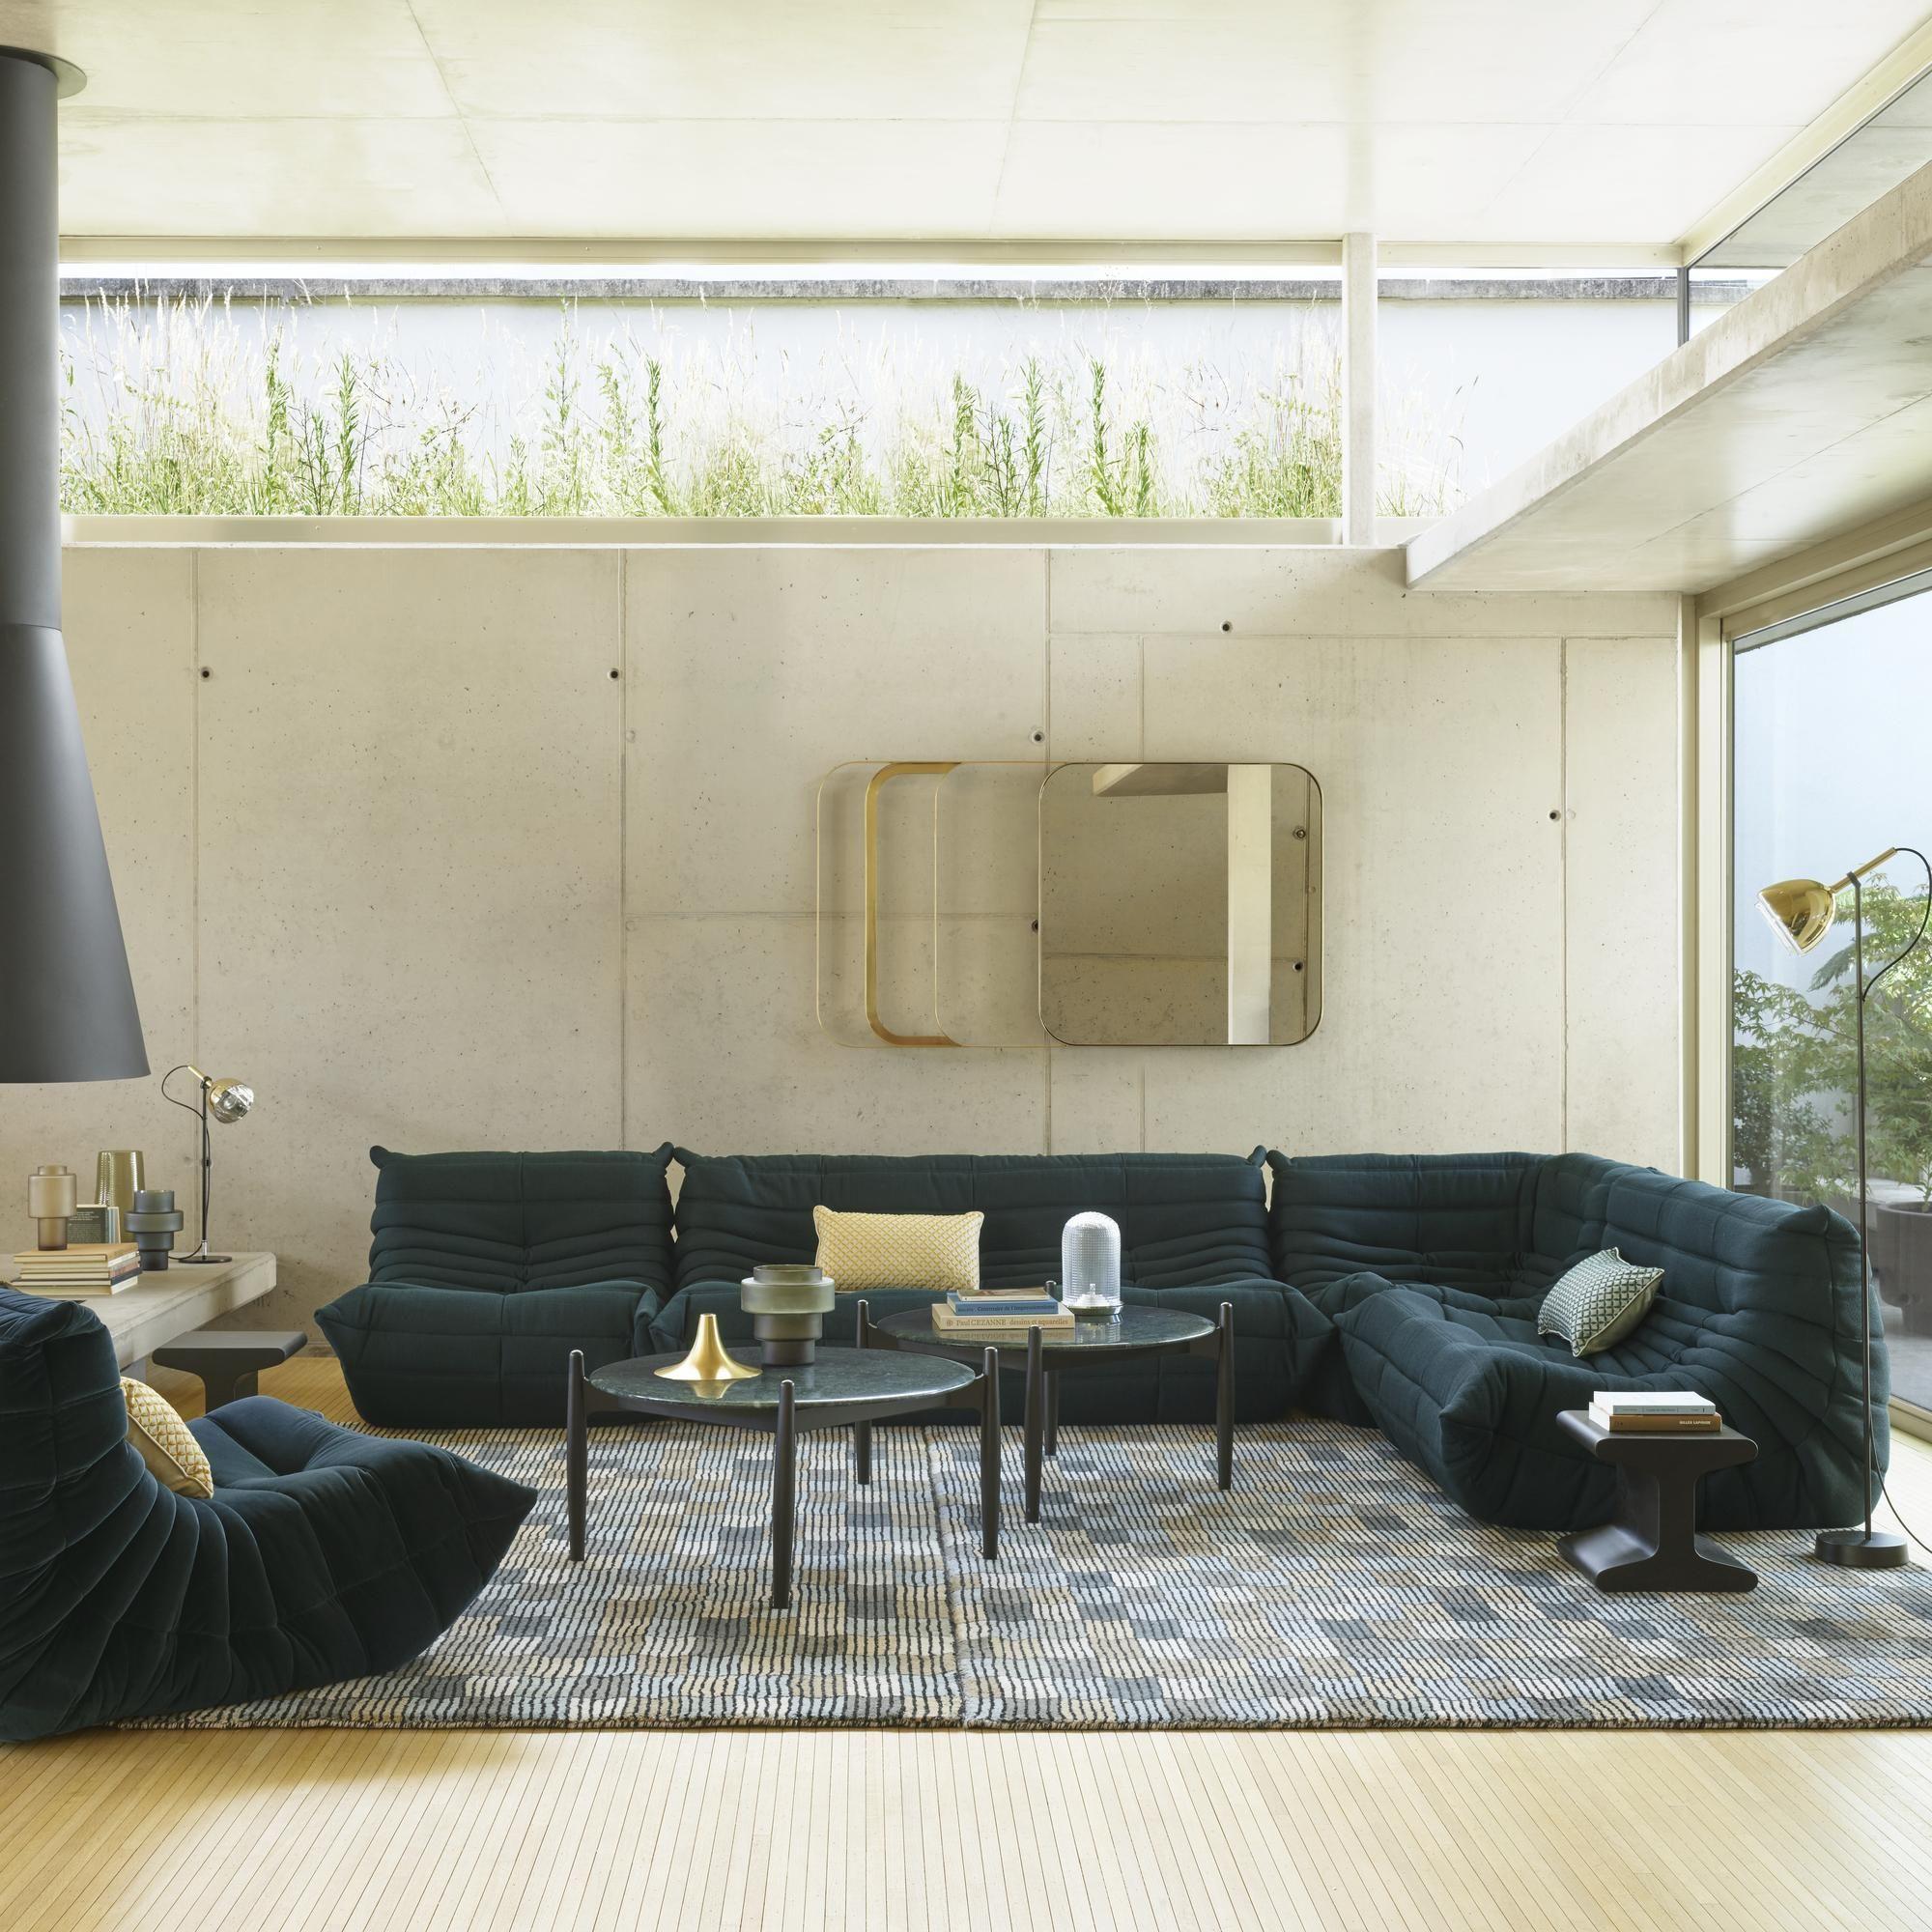 Togo Sofas From Designer Michel Ducaroy Ligne Roset Official Site In 2020 Furniture Furniture Prices European Furniture